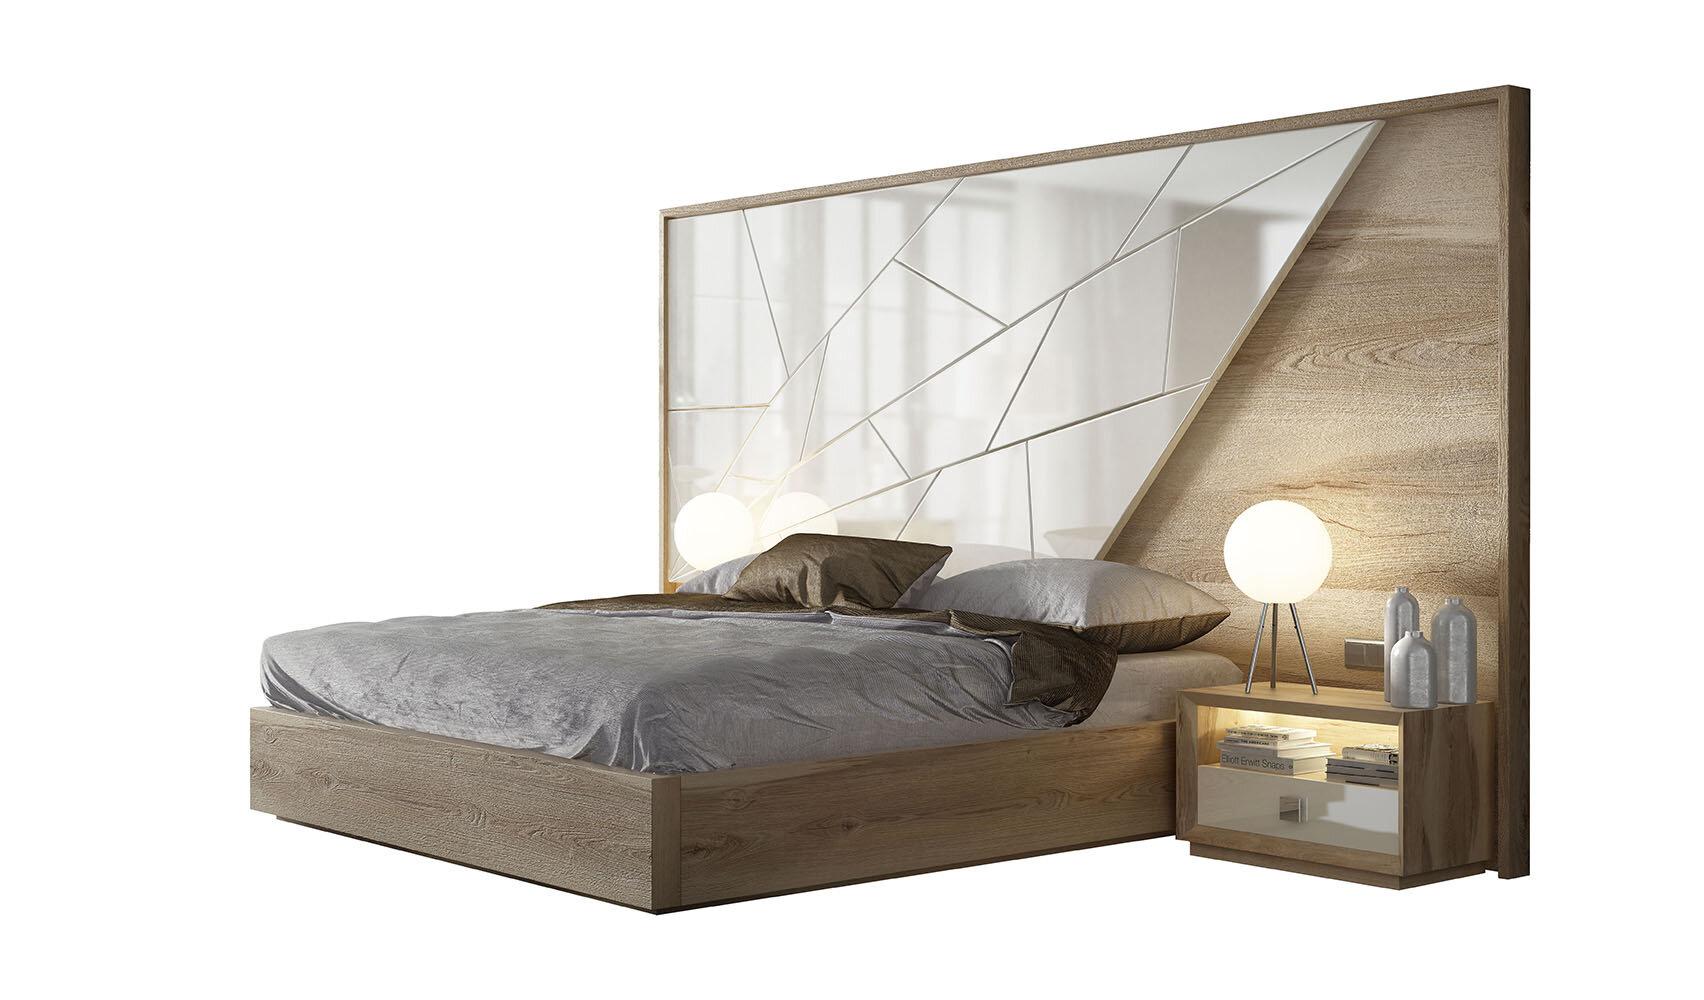 Hispania Home London Bedor47 Bedroom Set 3 Pieces